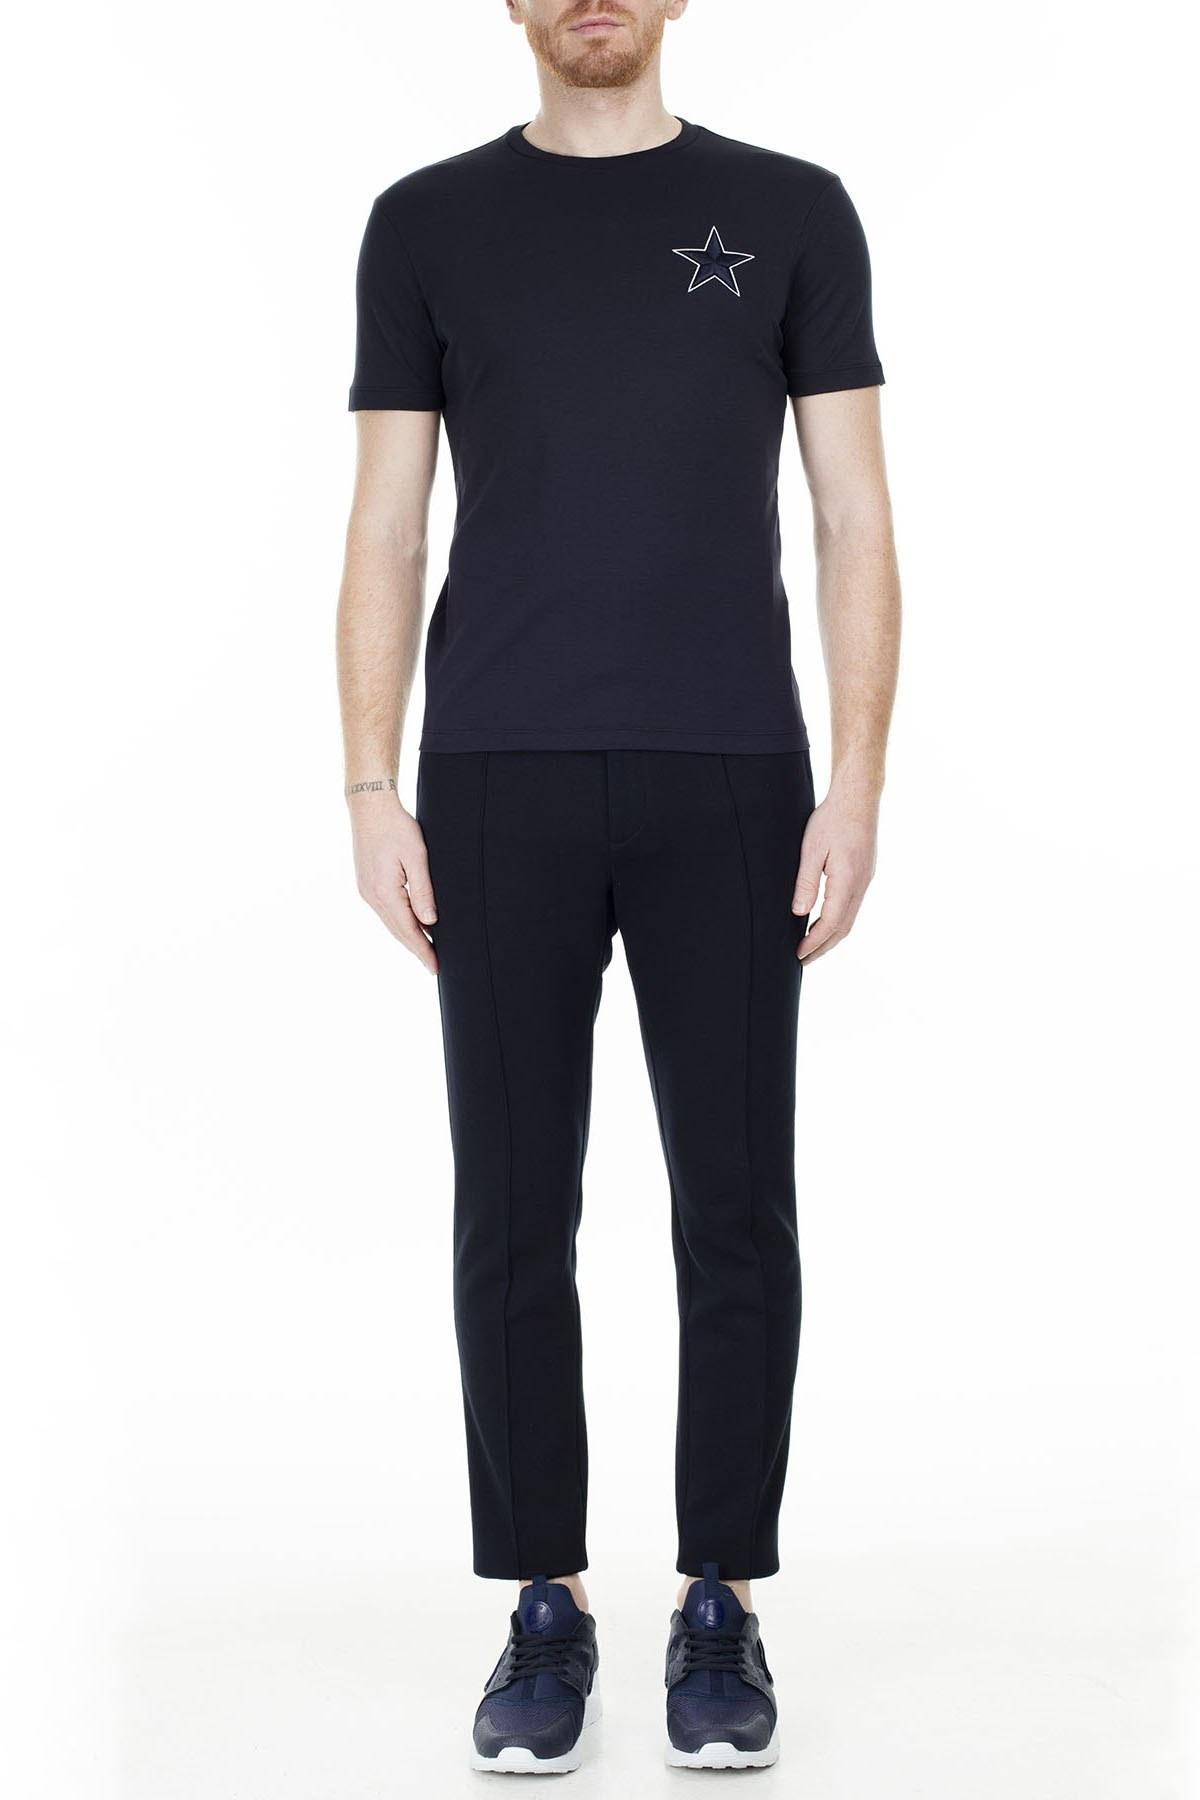 Emporio Armani Erkek T Shirt S 6G1TE3 1JPRZ 0922 LACİVERT